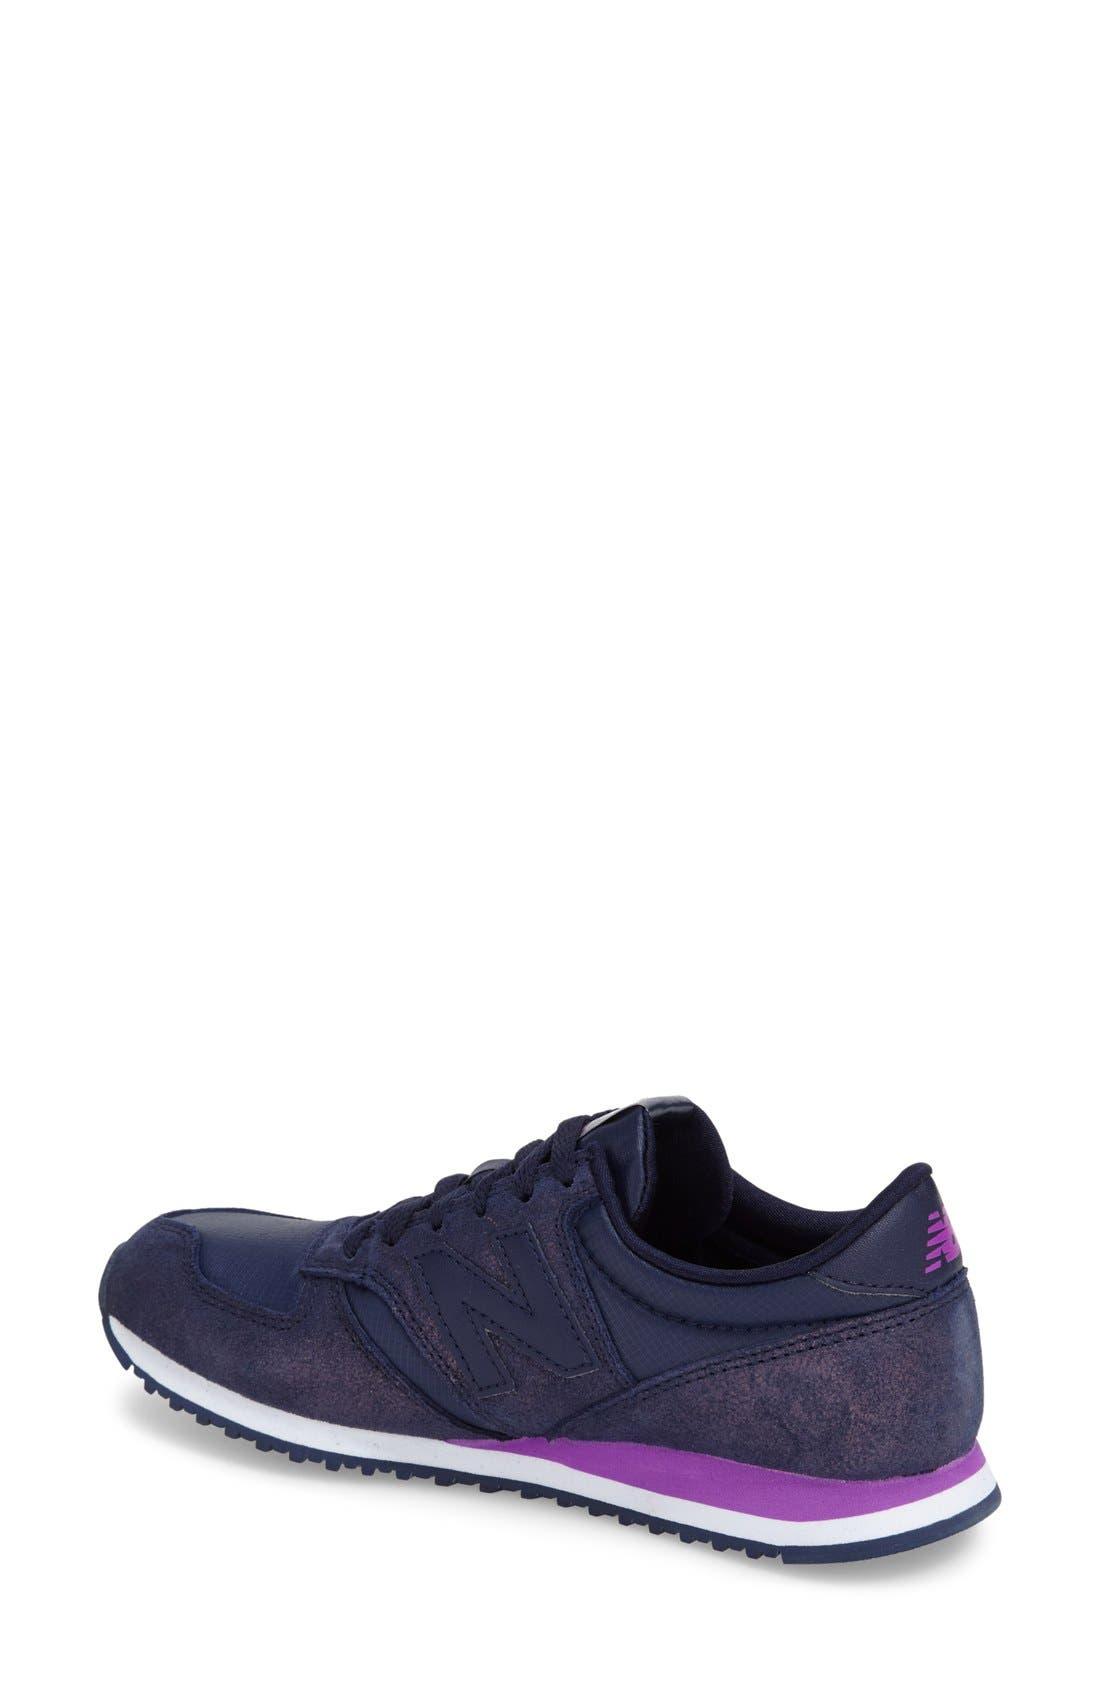 Alternate Image 2  - New Balance '420' Sneaker (Women)